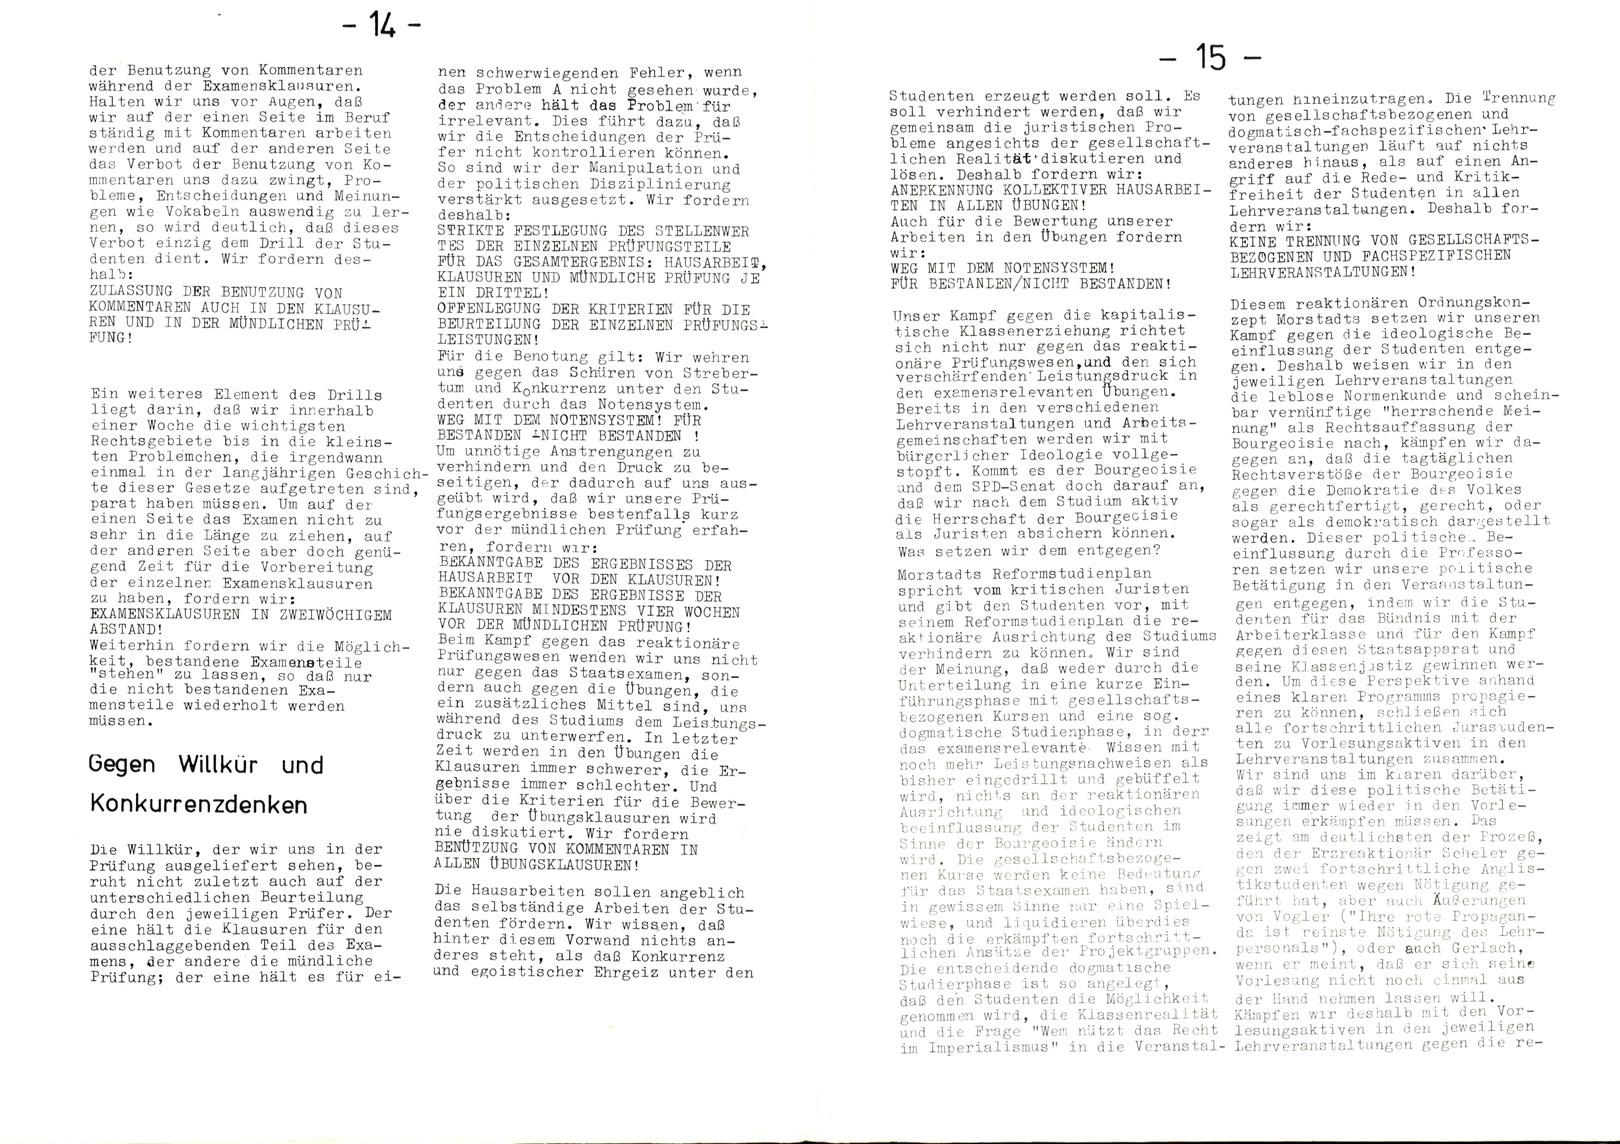 Berlin_KSV_Jura_Studentenpresse_19730600_20_08